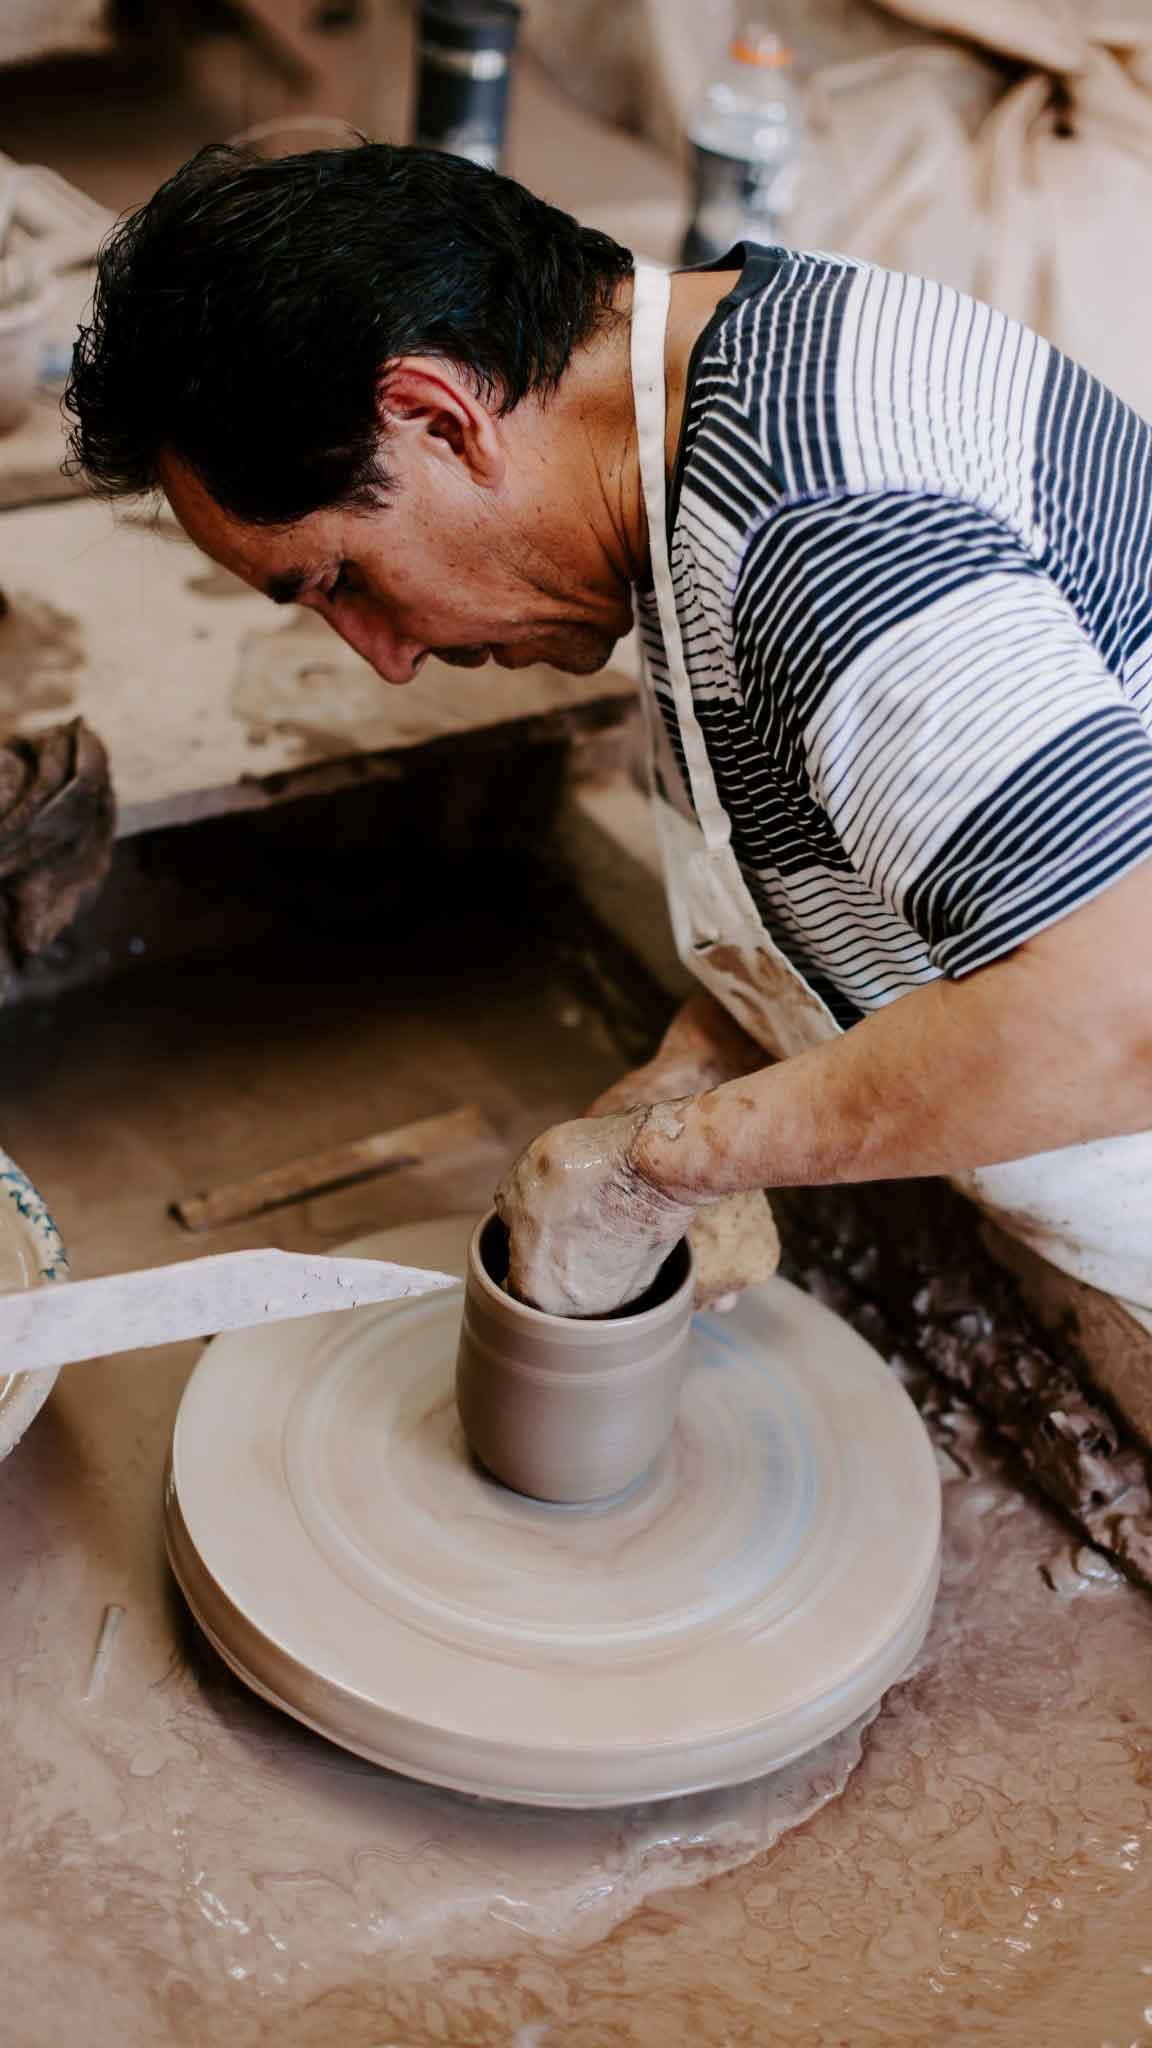 Makers of Hand-Turned Stoneware in Marshall, TX - Martinez